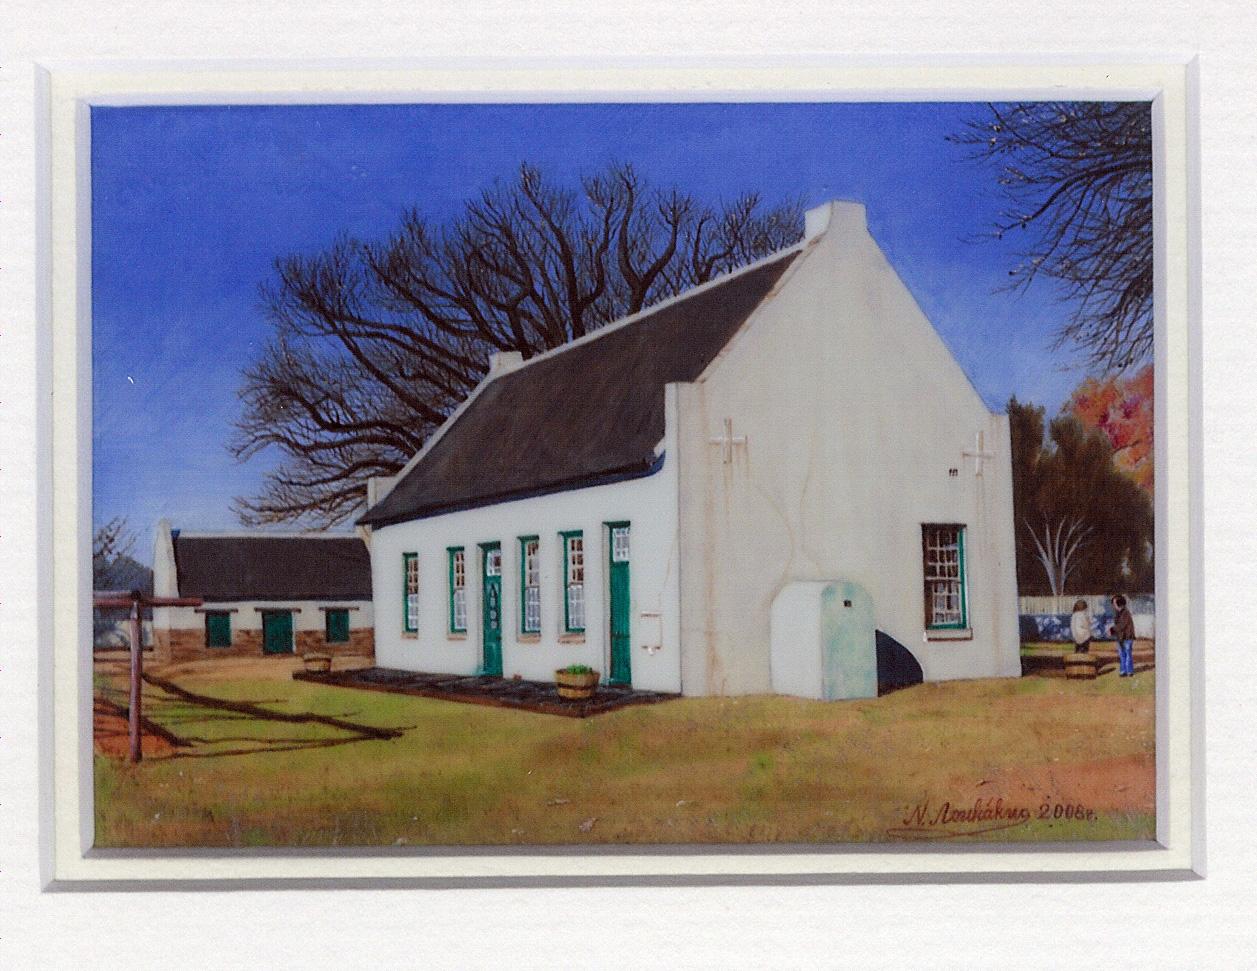 66 President Pretorius Woning, Potchesfstroom by Nikolai Loukakis - Oil on Polymin